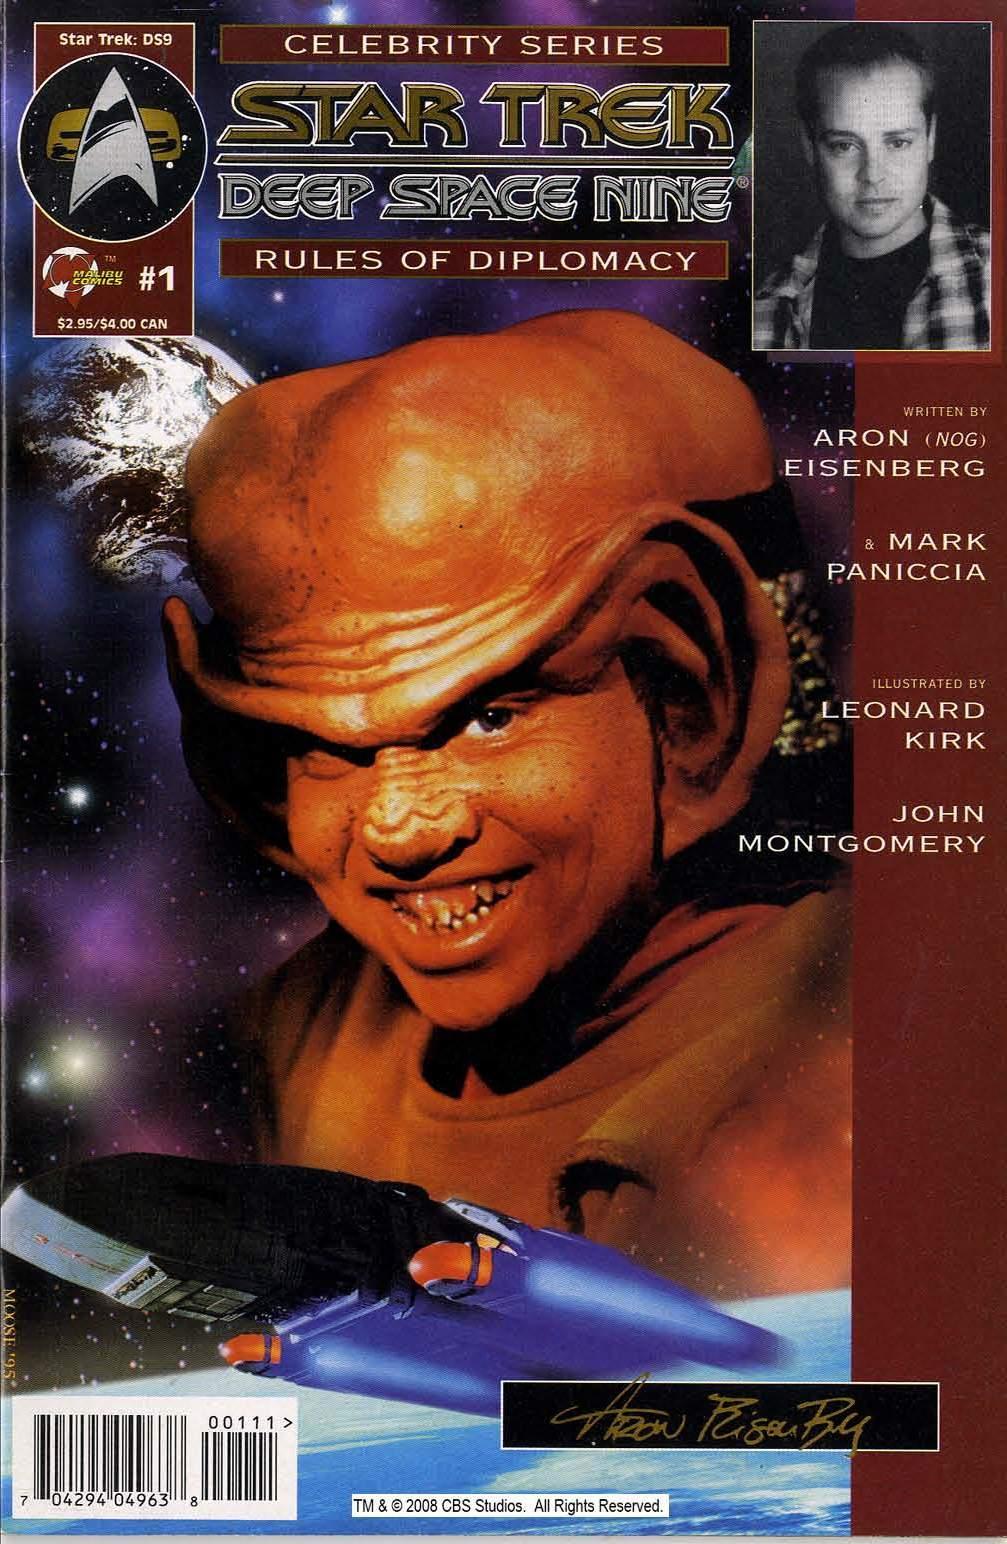 Star Trek: Deep Space Nine, The Celebrity Series: The Rules of Diplomacy Vol 1 1